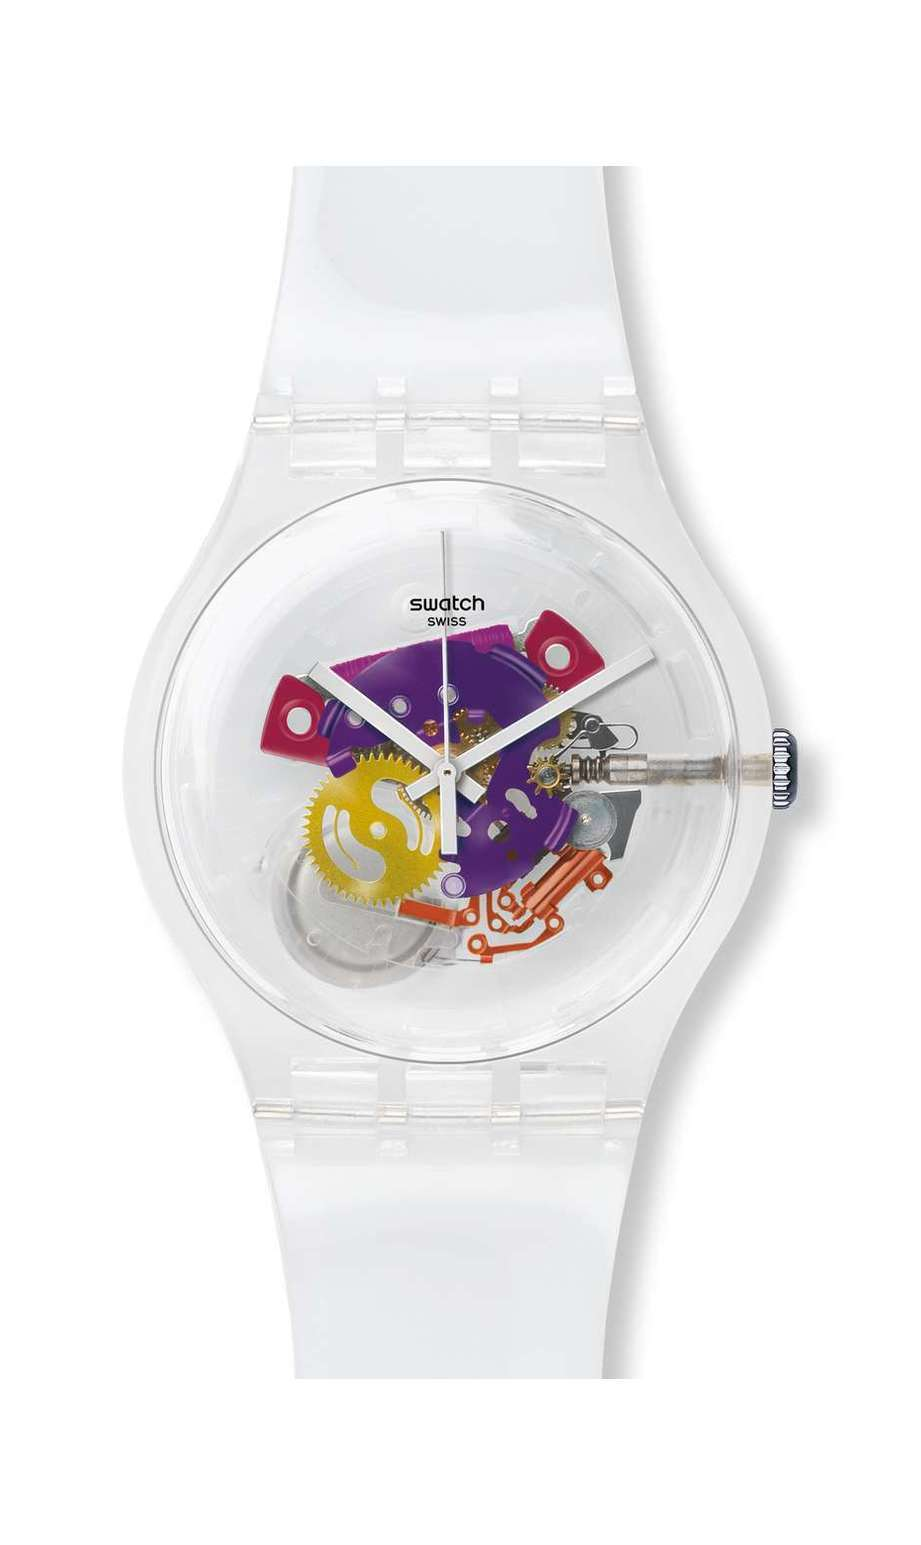 Swatch - RANDOM GHOST - 1